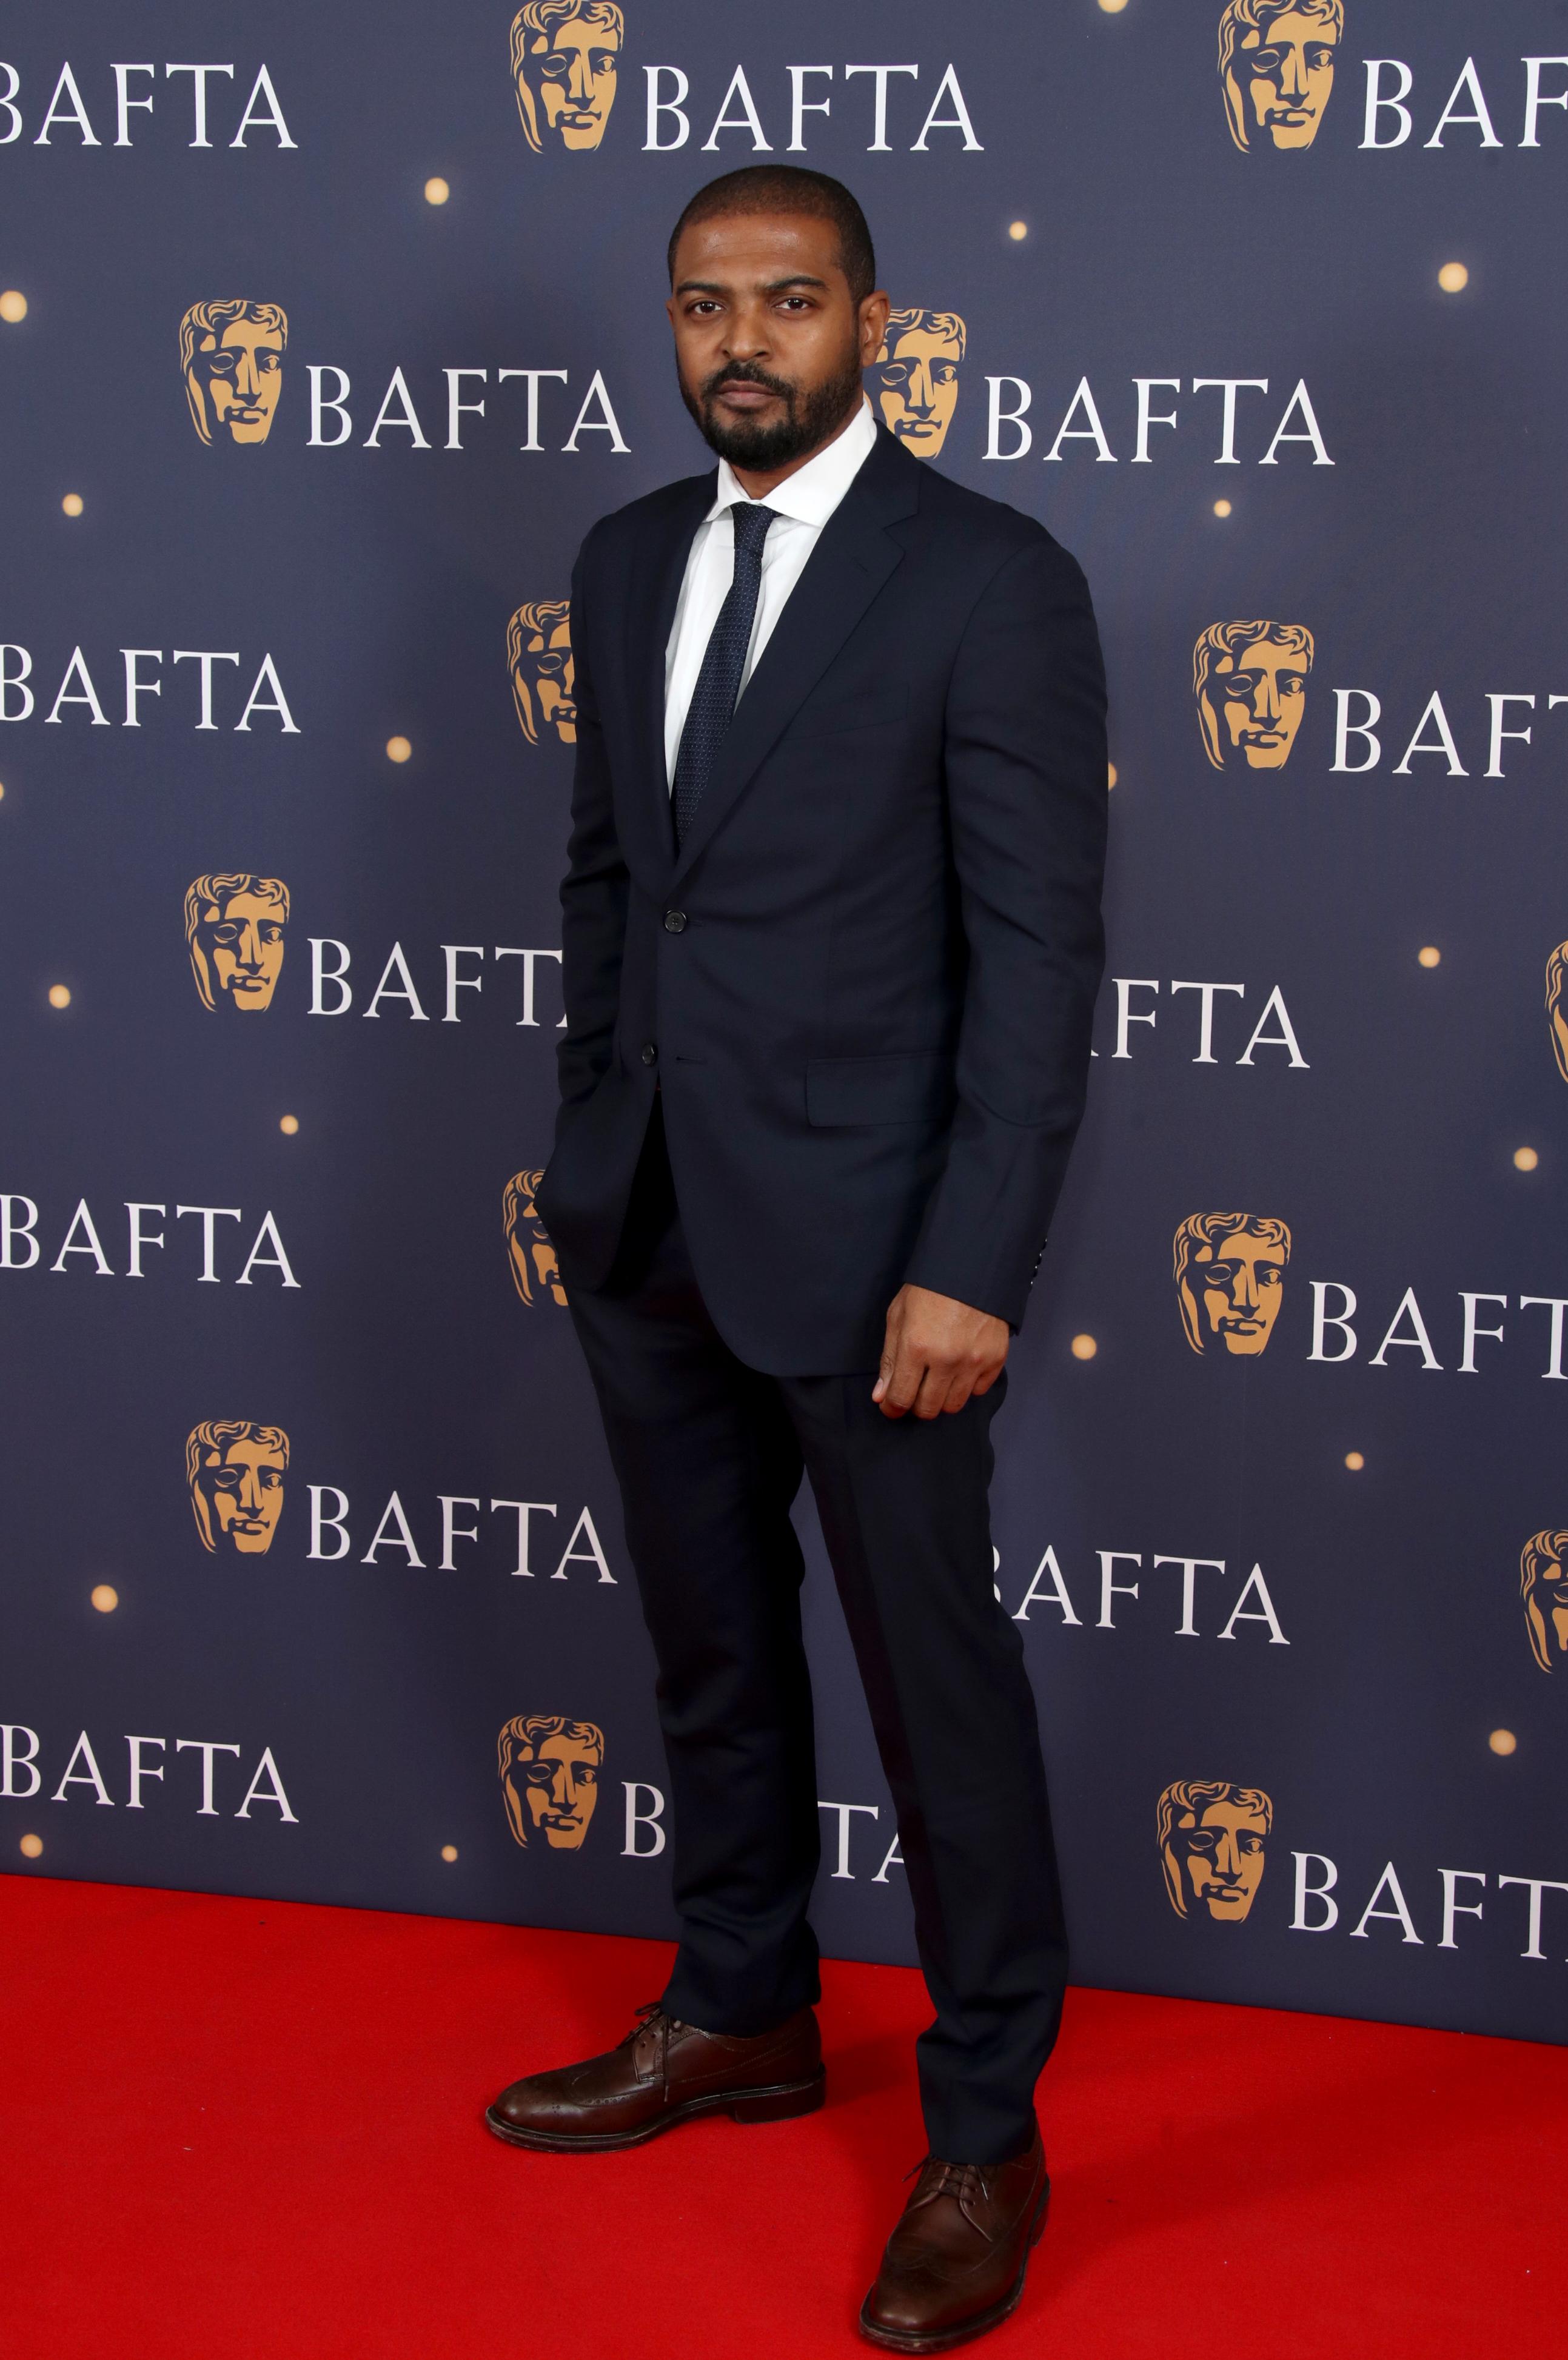 Noel Clarke, BAFTA Film Gala at the The Savoy Hotel, February 08, 2019 in London, England.